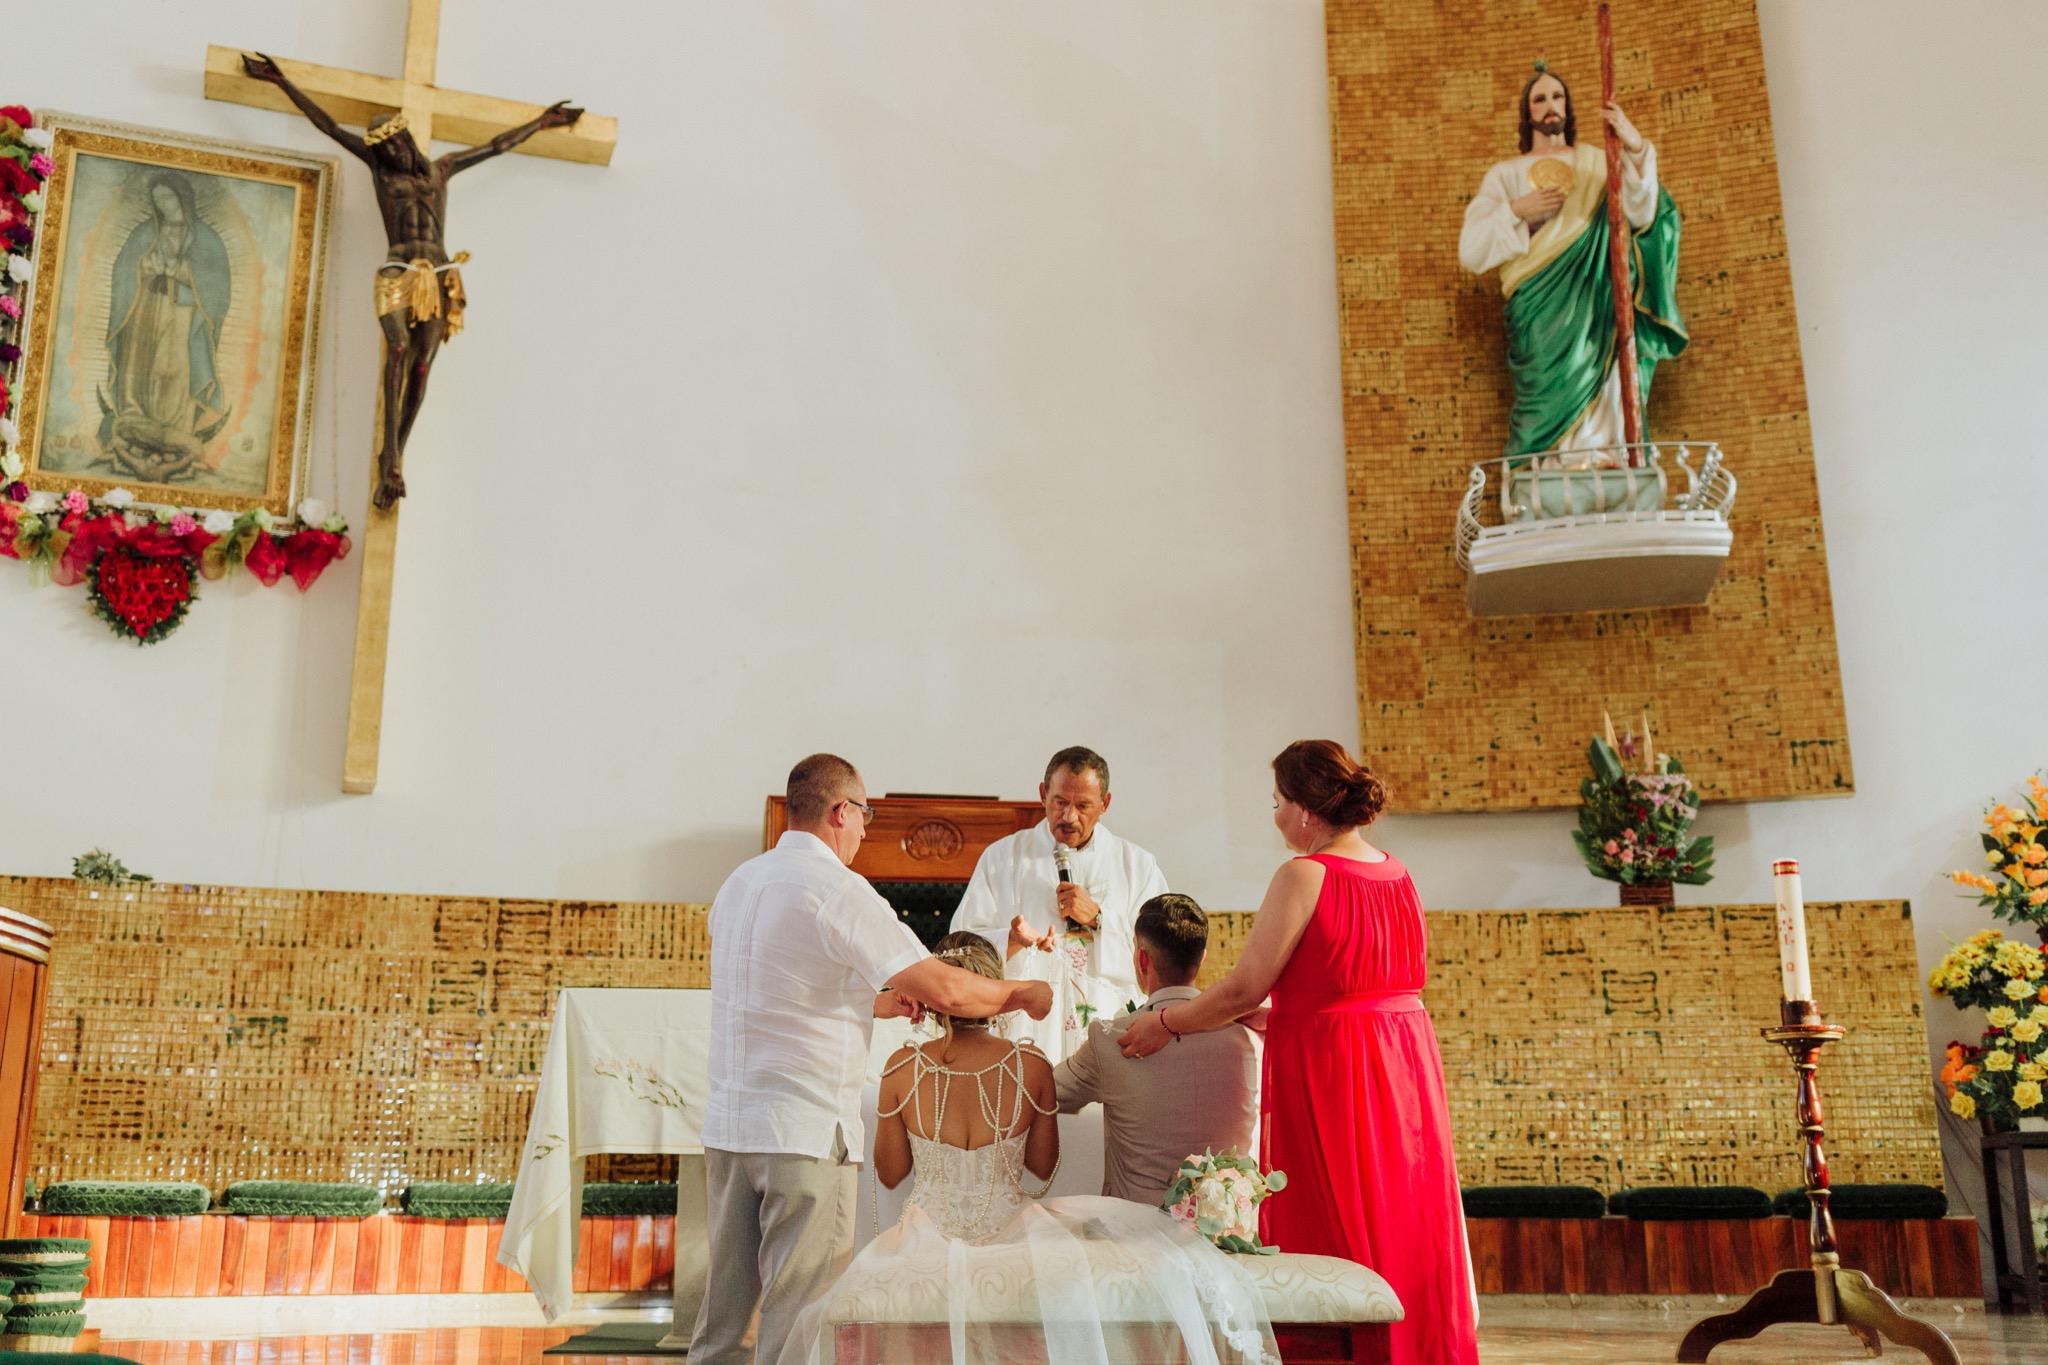 Javier_noriega_fotografo_bodas_profesional_zacatecas_mexico_mazatlan_sinaloa_photographer_weddings28